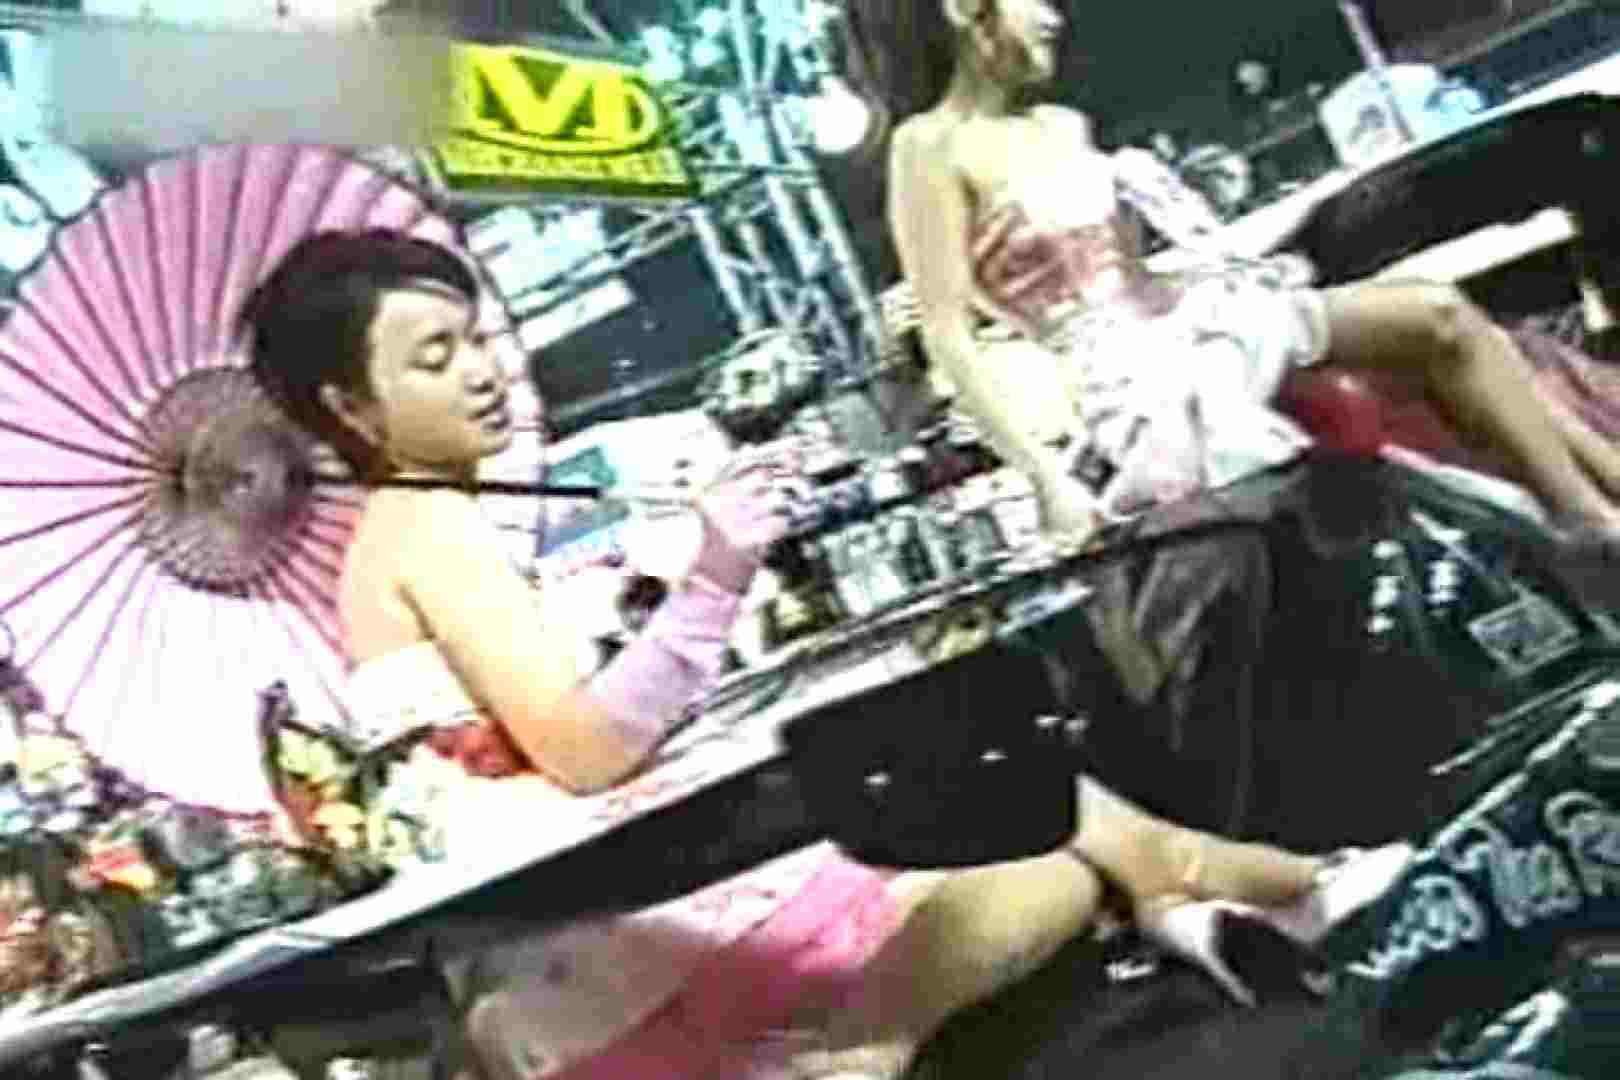 RQカメラ地獄Vol.24 お姉さん丸裸 | 美しいOLの裸体  95pic 15